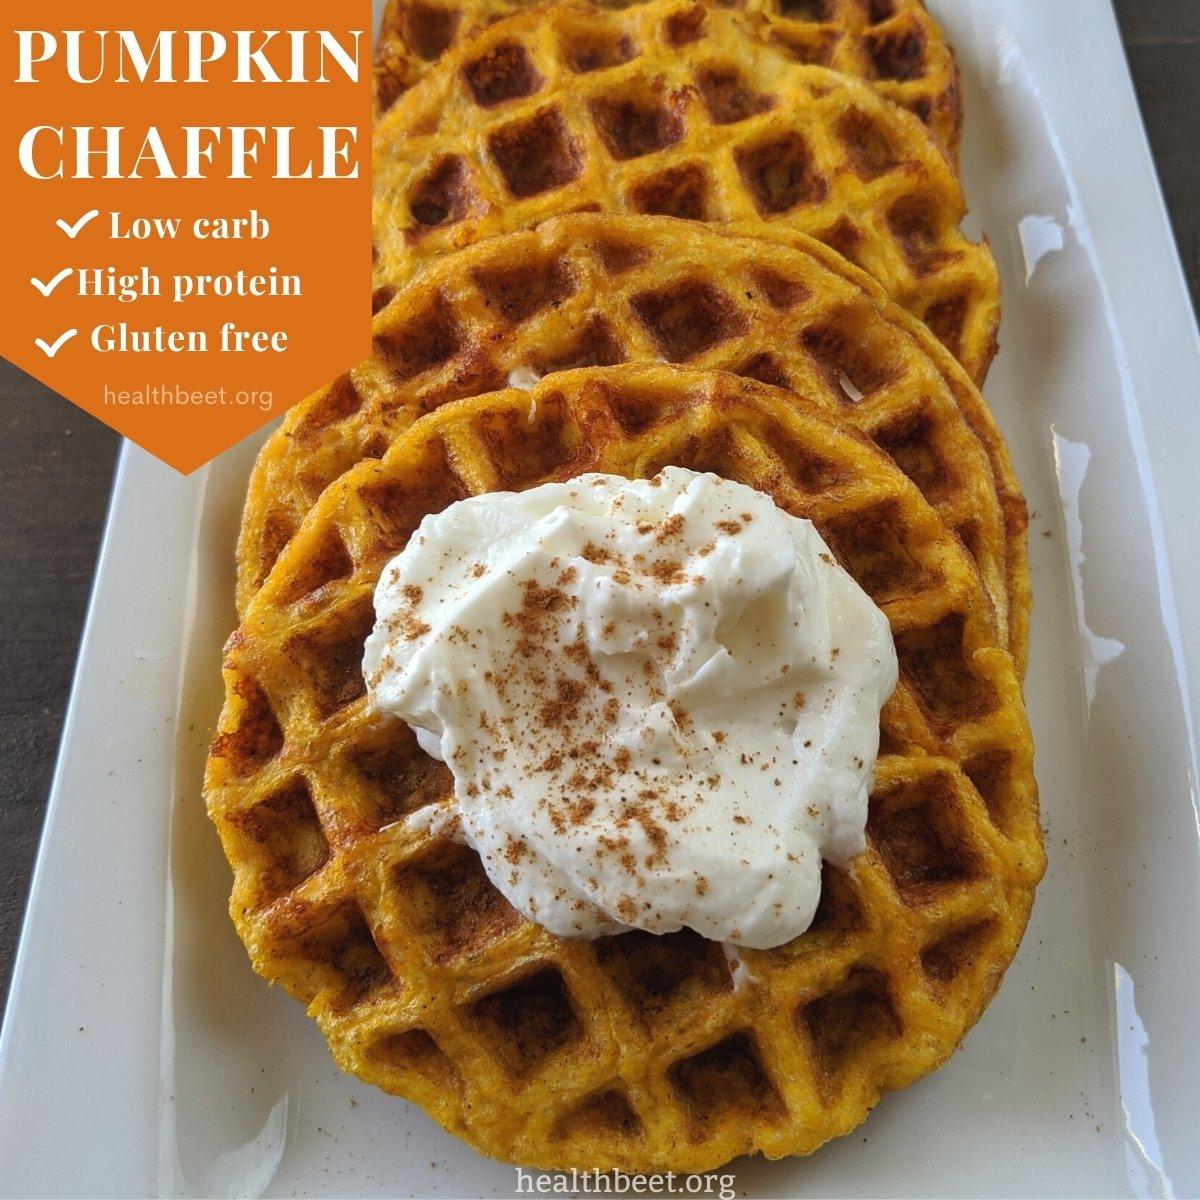 low carb high protein gluten free pumpkin chaffle